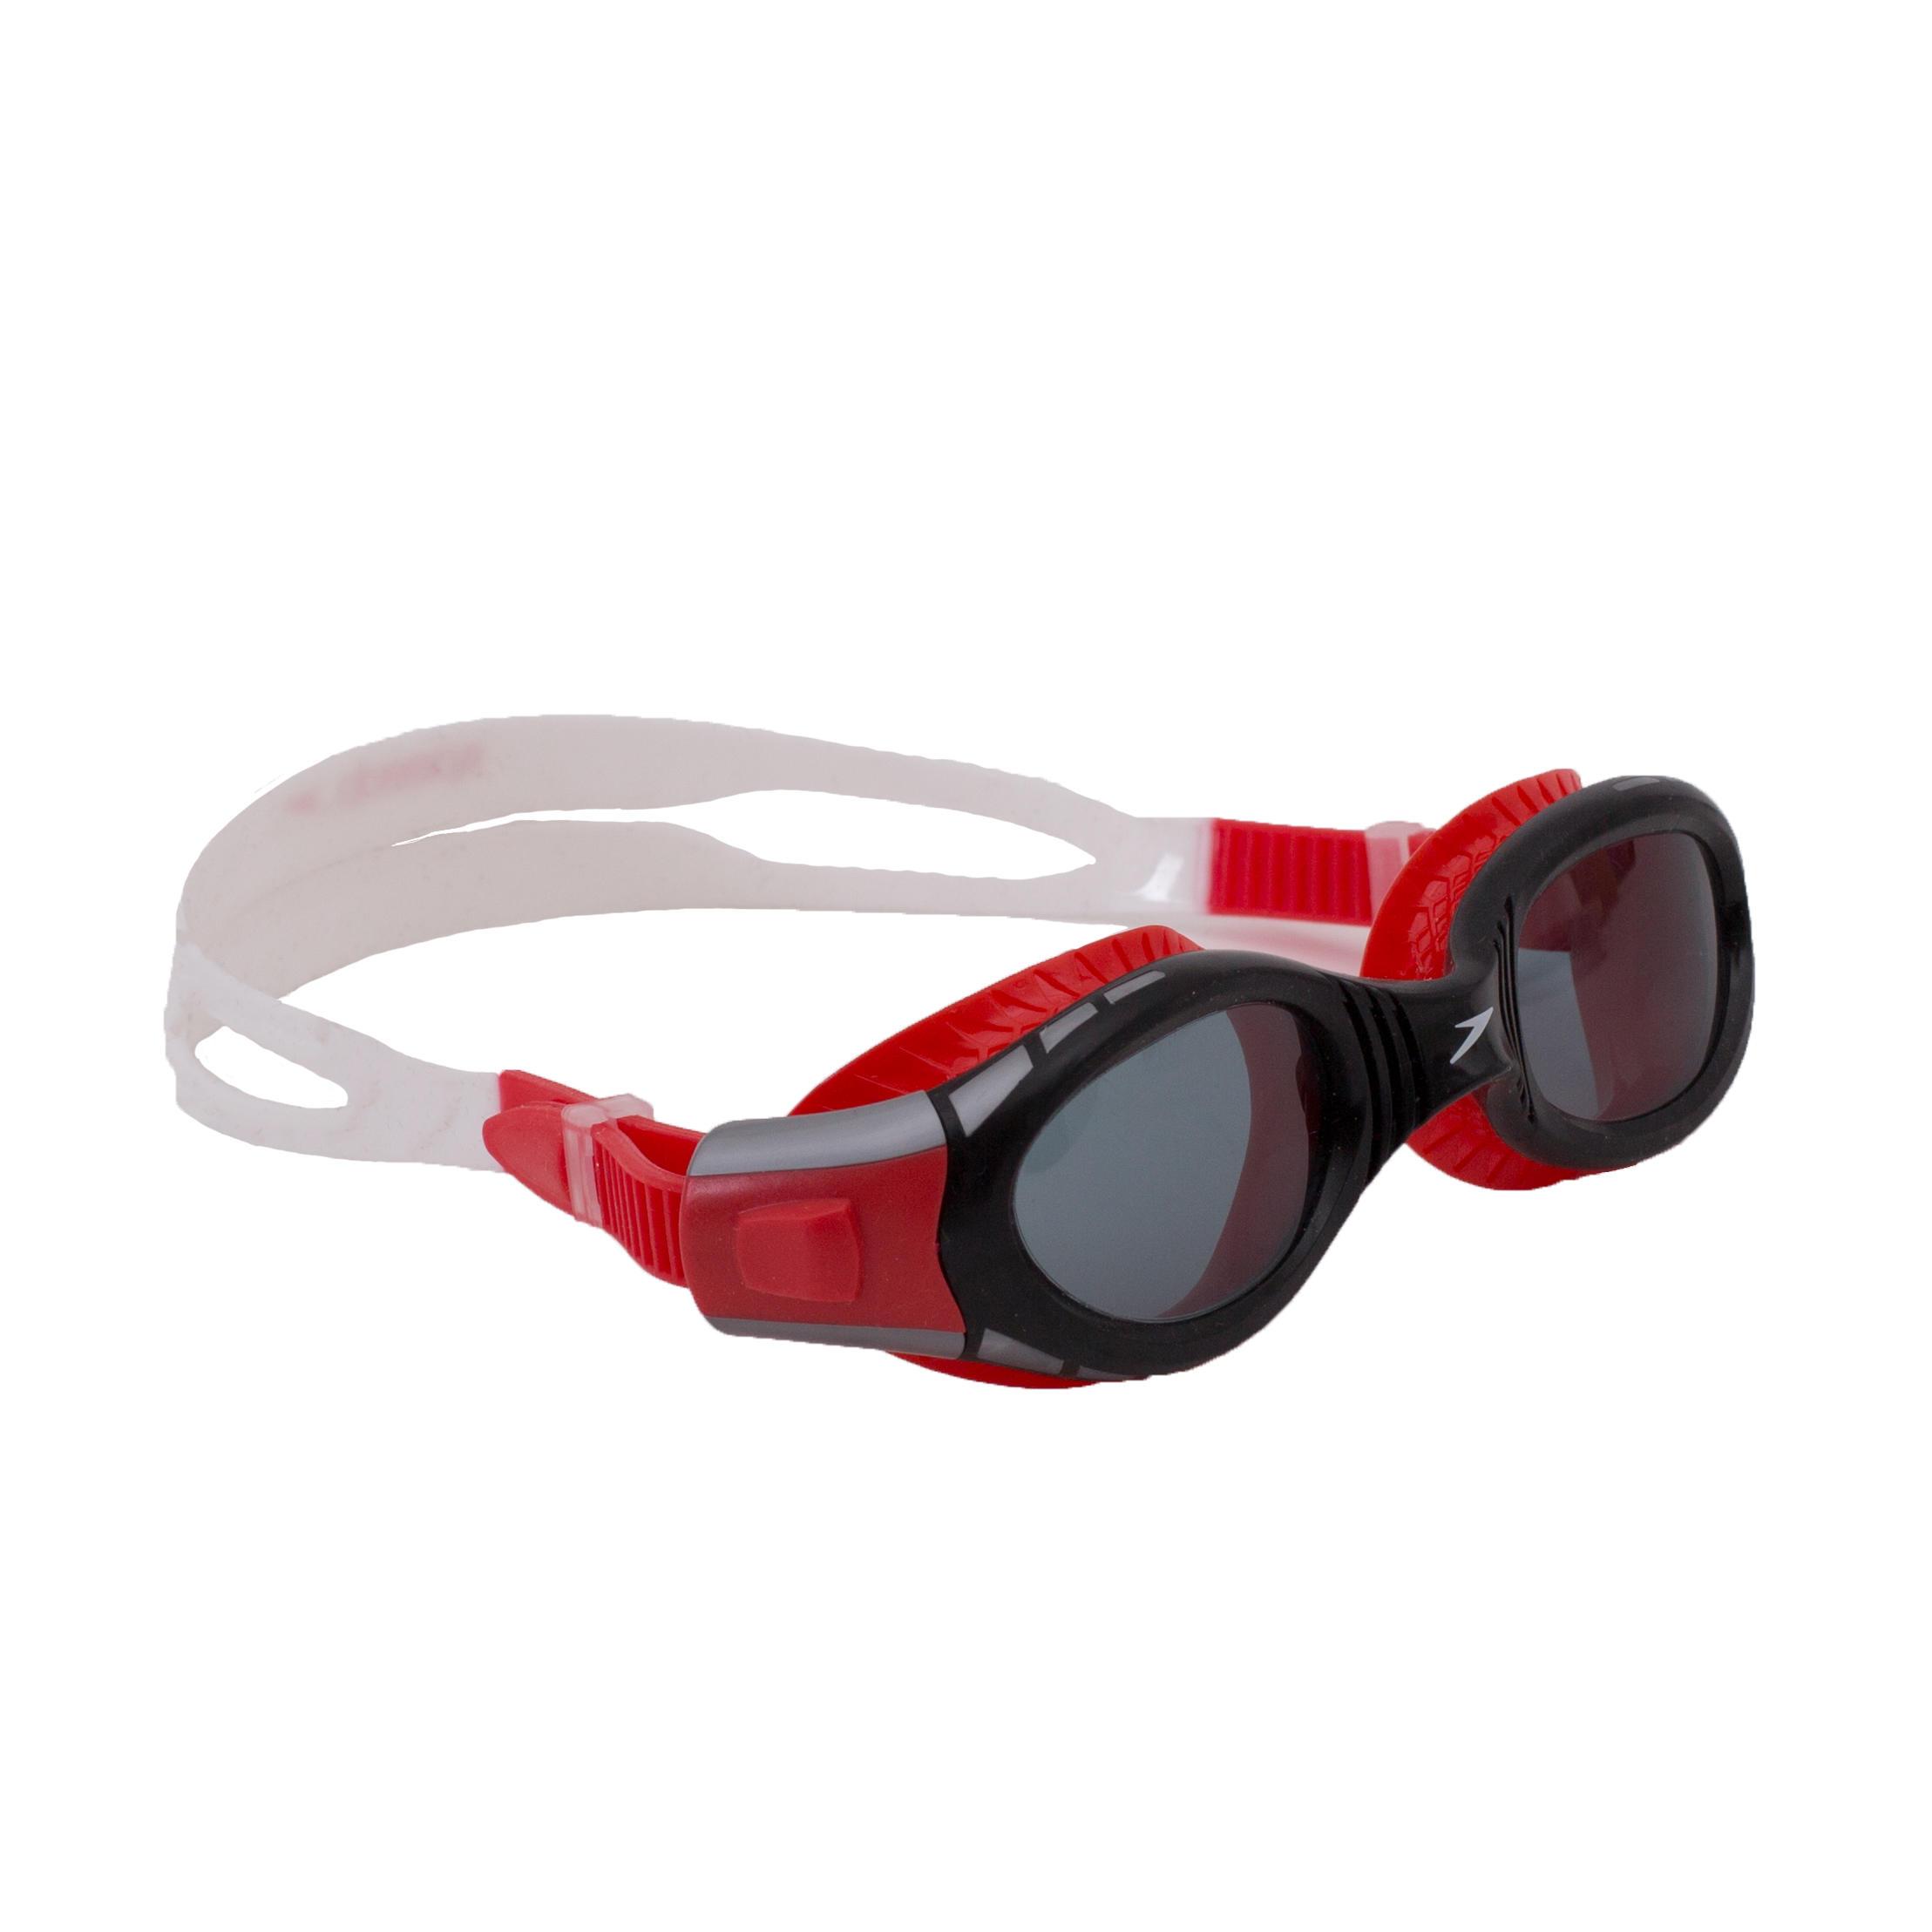 Ochelari Înot Futura Biofuse S